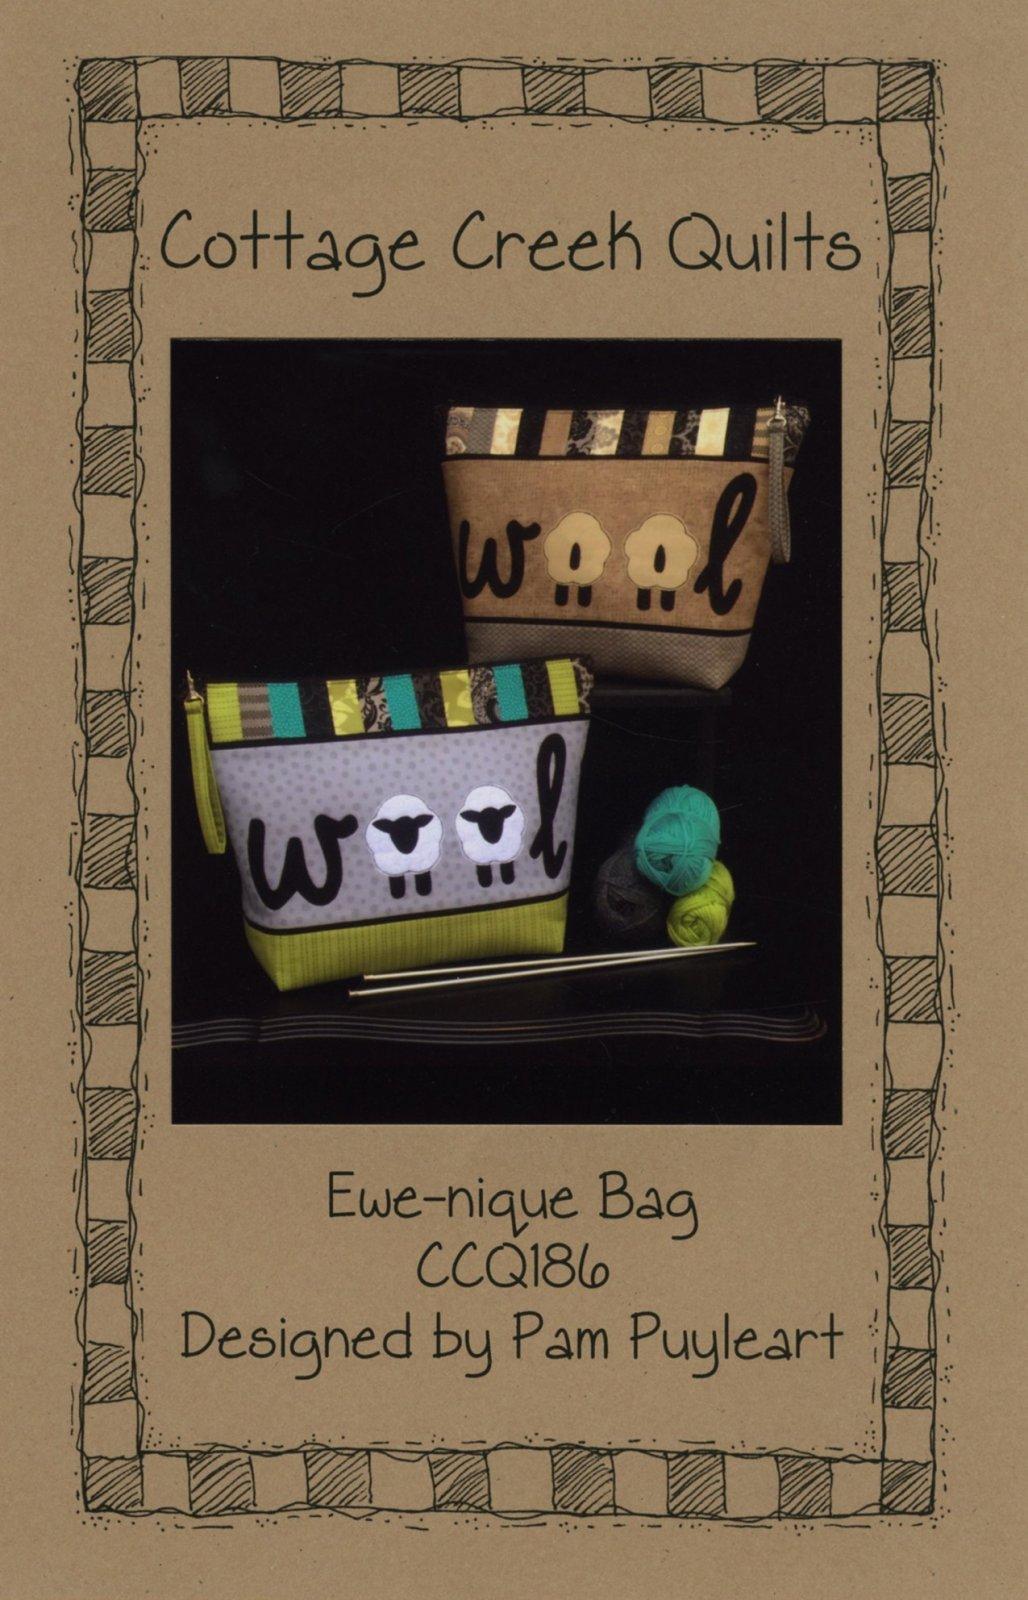 Ewe-nique Bag